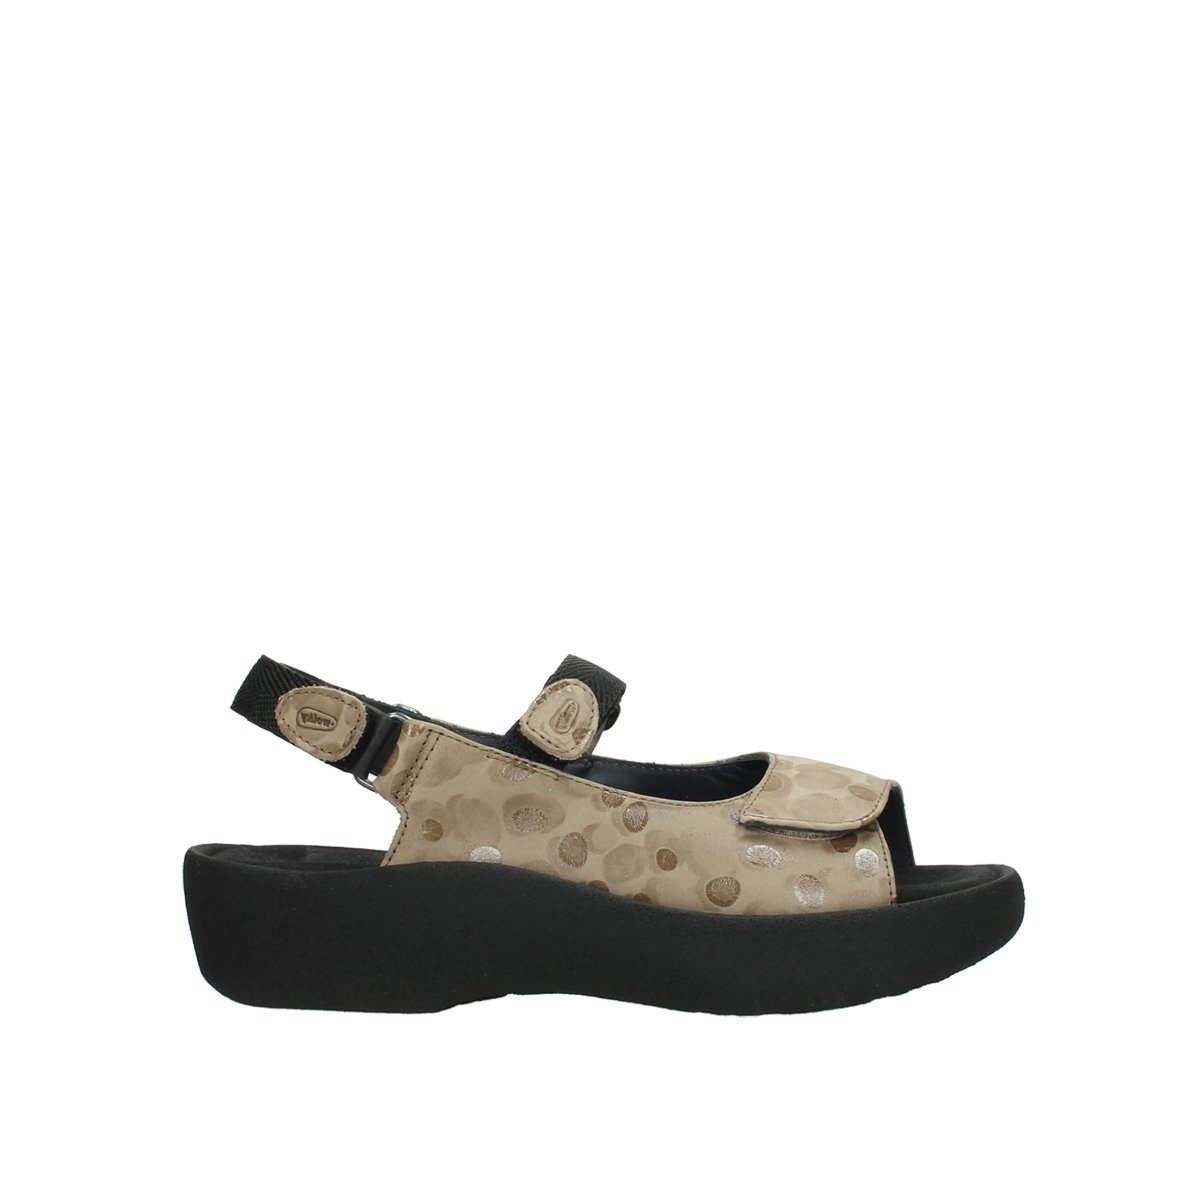 Wolky Womens 3204 Jewel Leather Sandals 36 EU|12390 Beige Nubuck